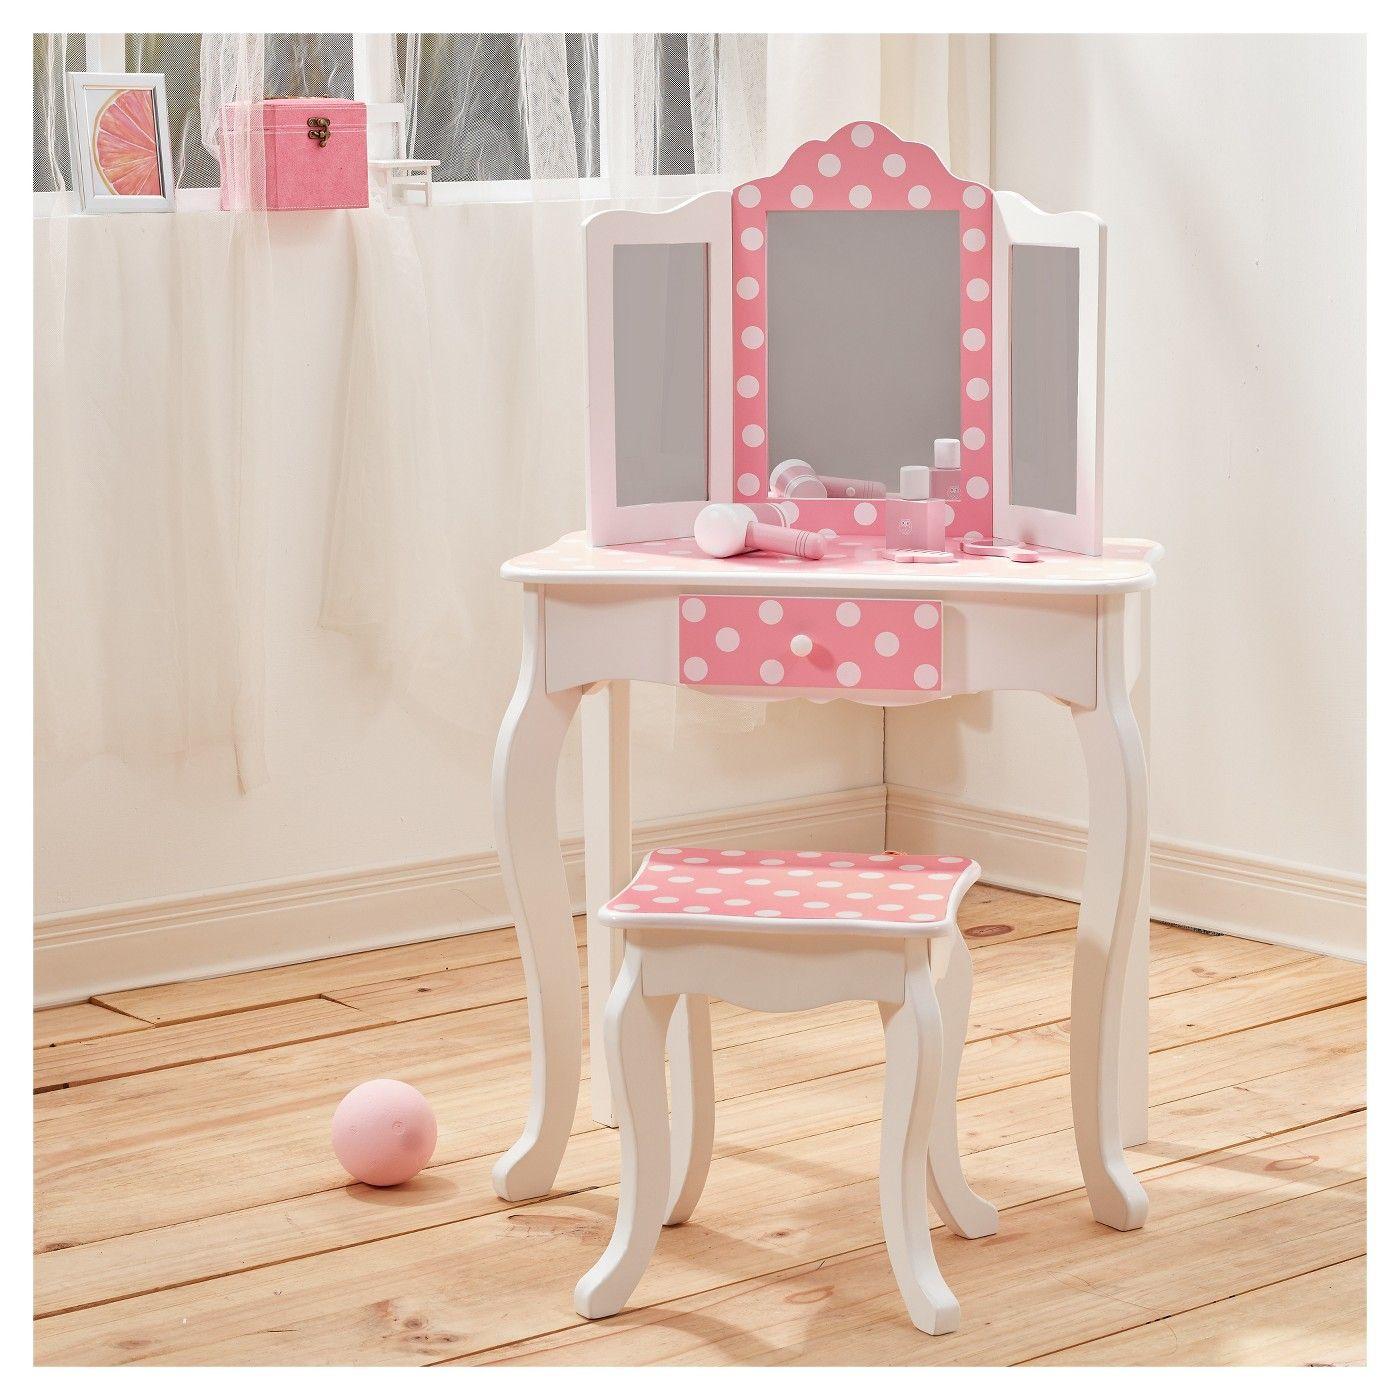 Fashion Prints Polka Dot Vanity Table Stool Set Teamson Kids